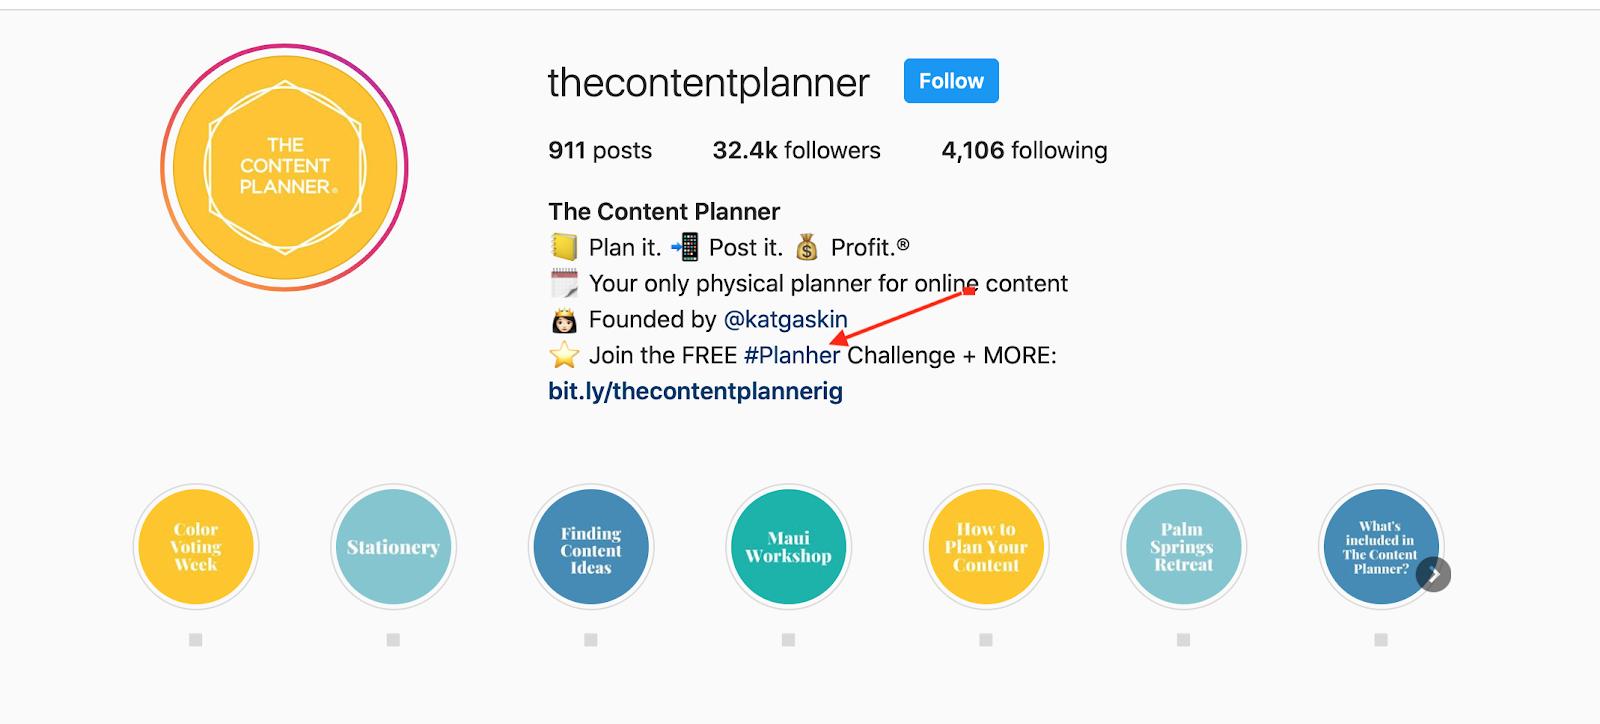 the content planner instagram bio hashtag optimize your instagram bioi